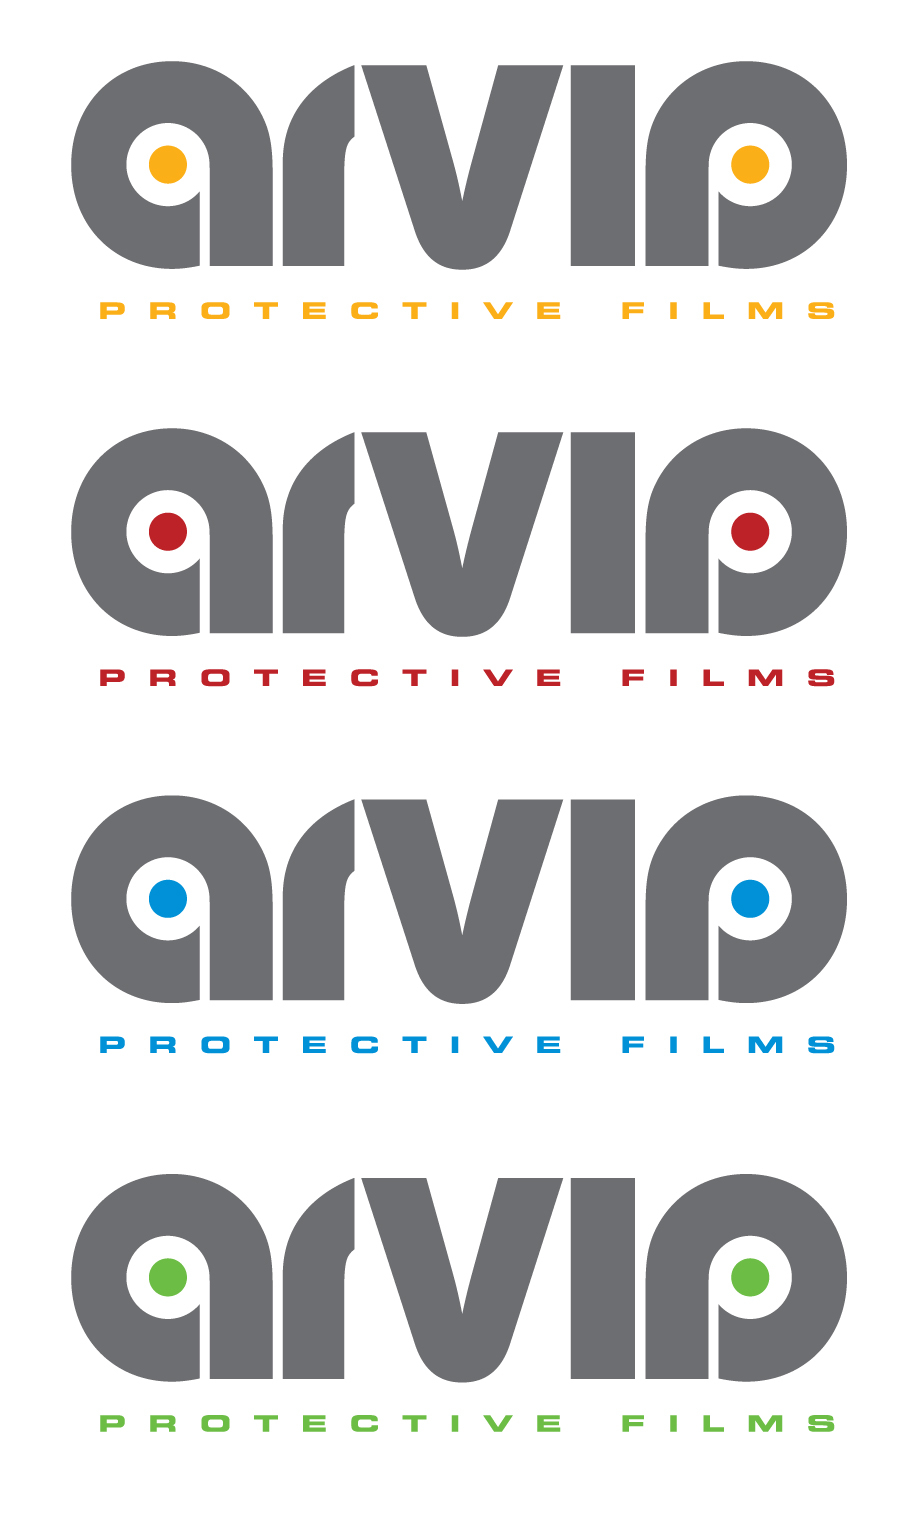 Arvia Glass Coatings